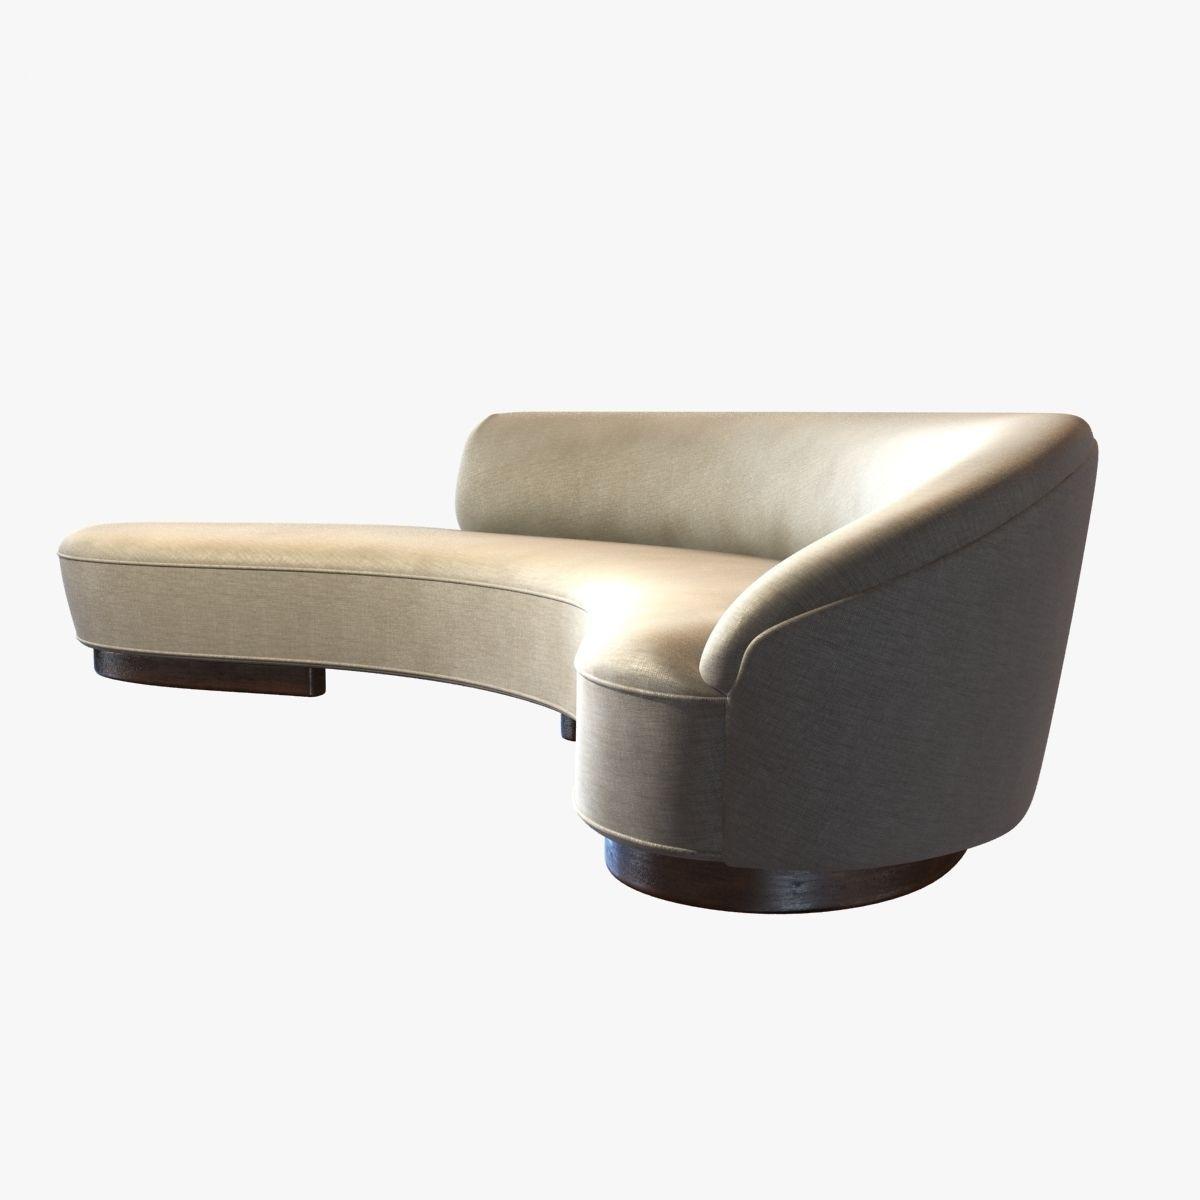 vladimir kagan freeform curved sofa with arm 3d model max obj 3ds fbx cgtrader